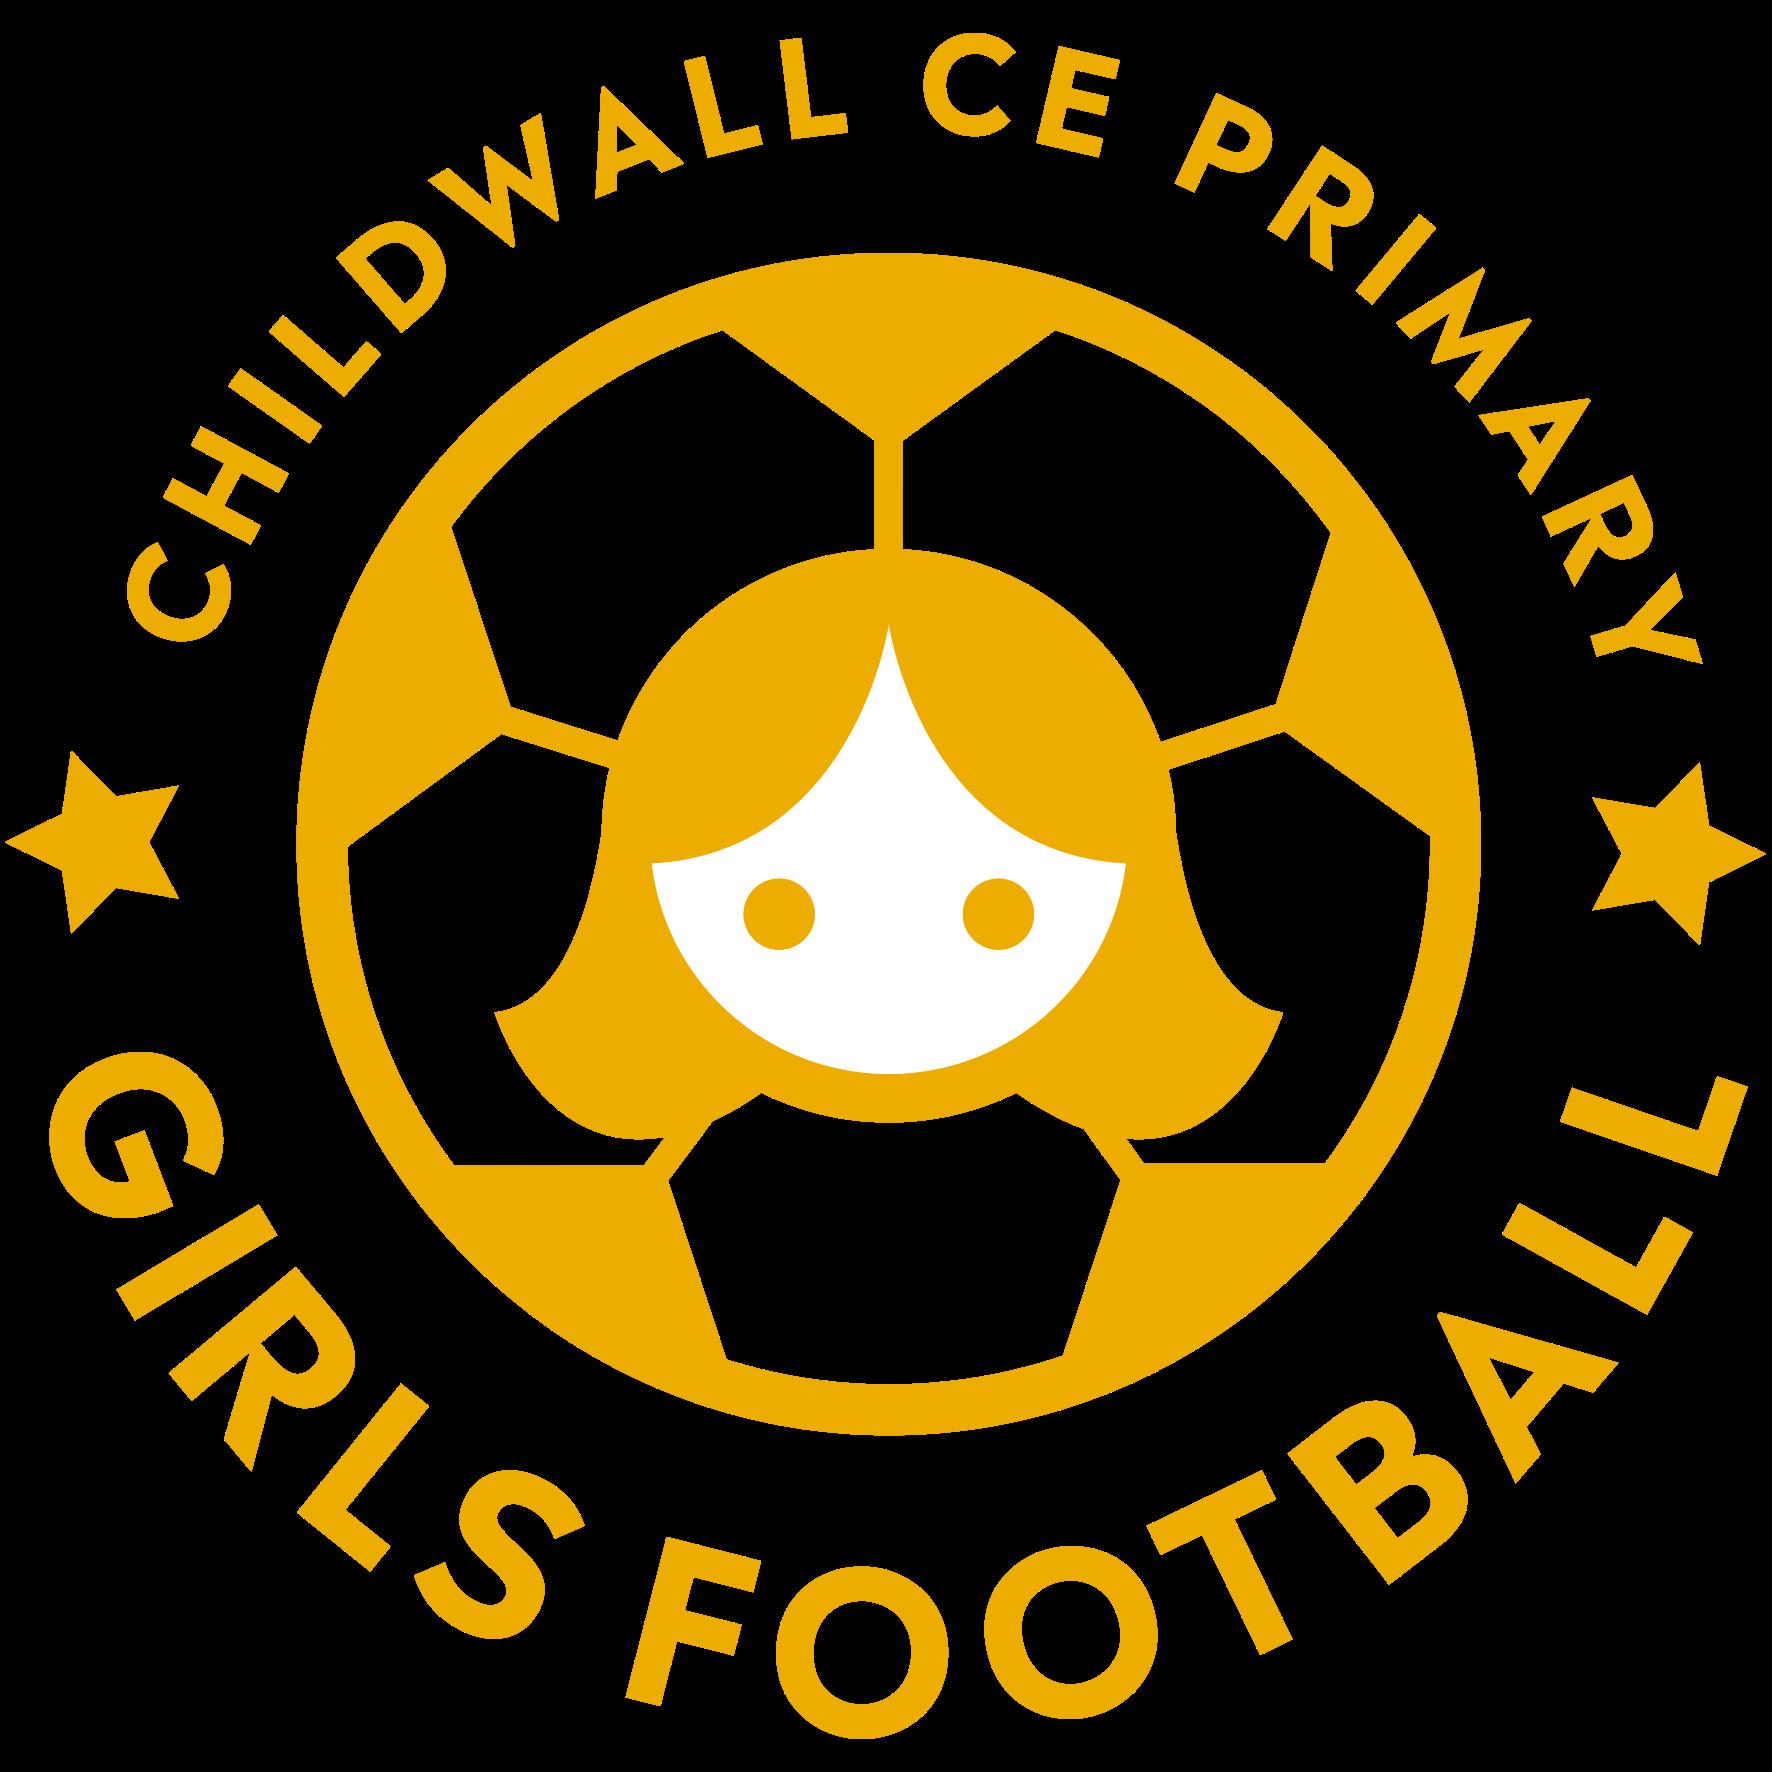 Childwall Year 5 GIRLS Football